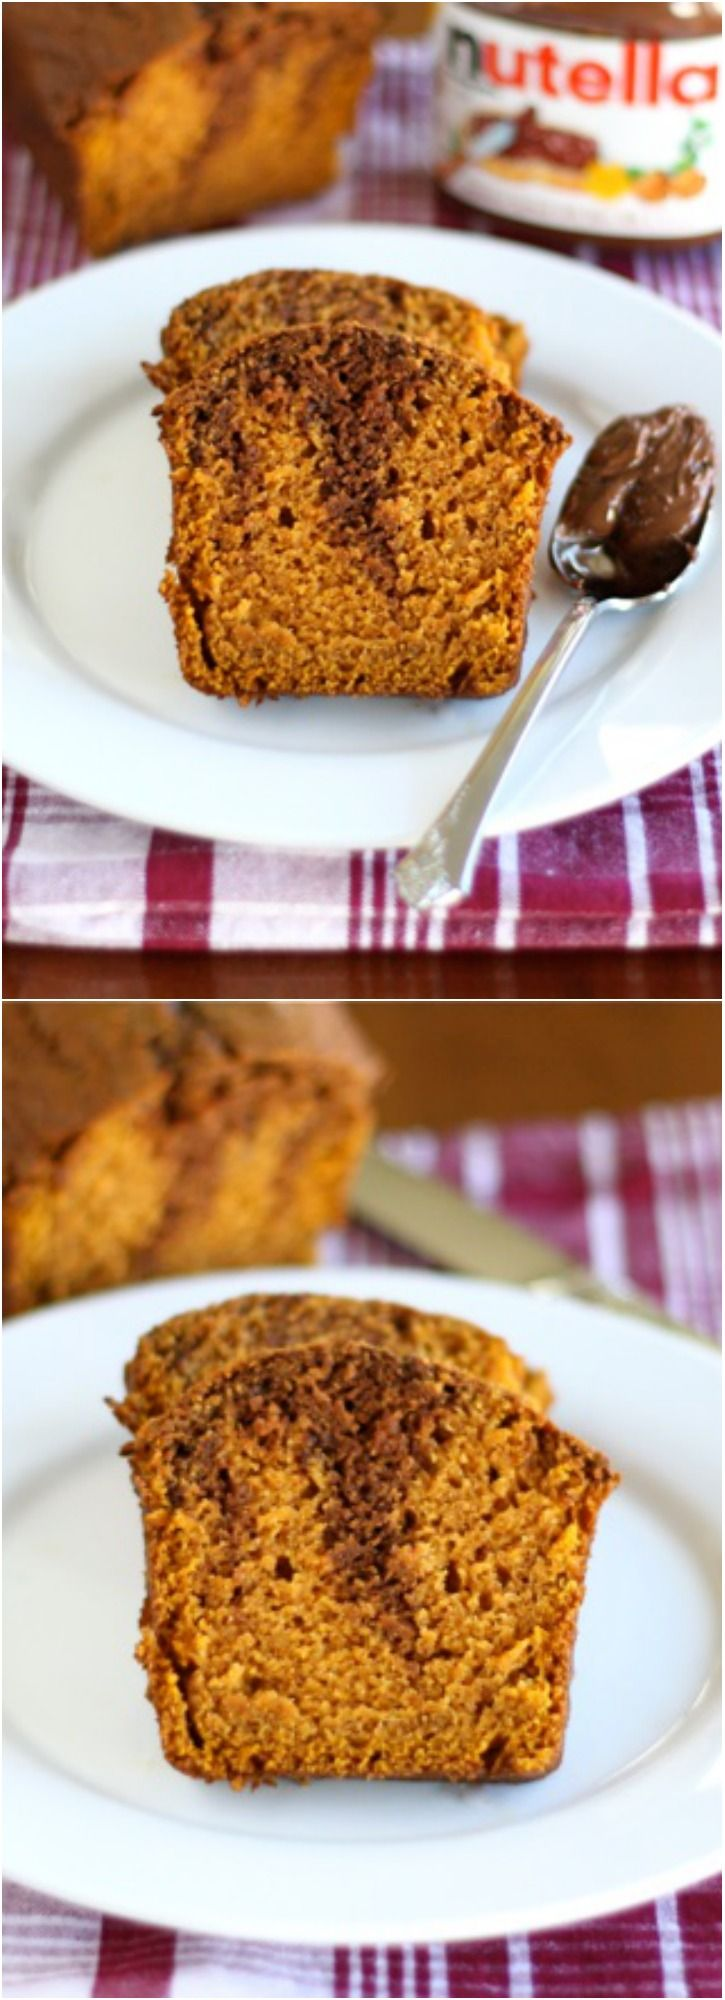 Pumpkin Nutella Bread Recipe on twopeasandtheirpod.com Pumpkin Bread ...